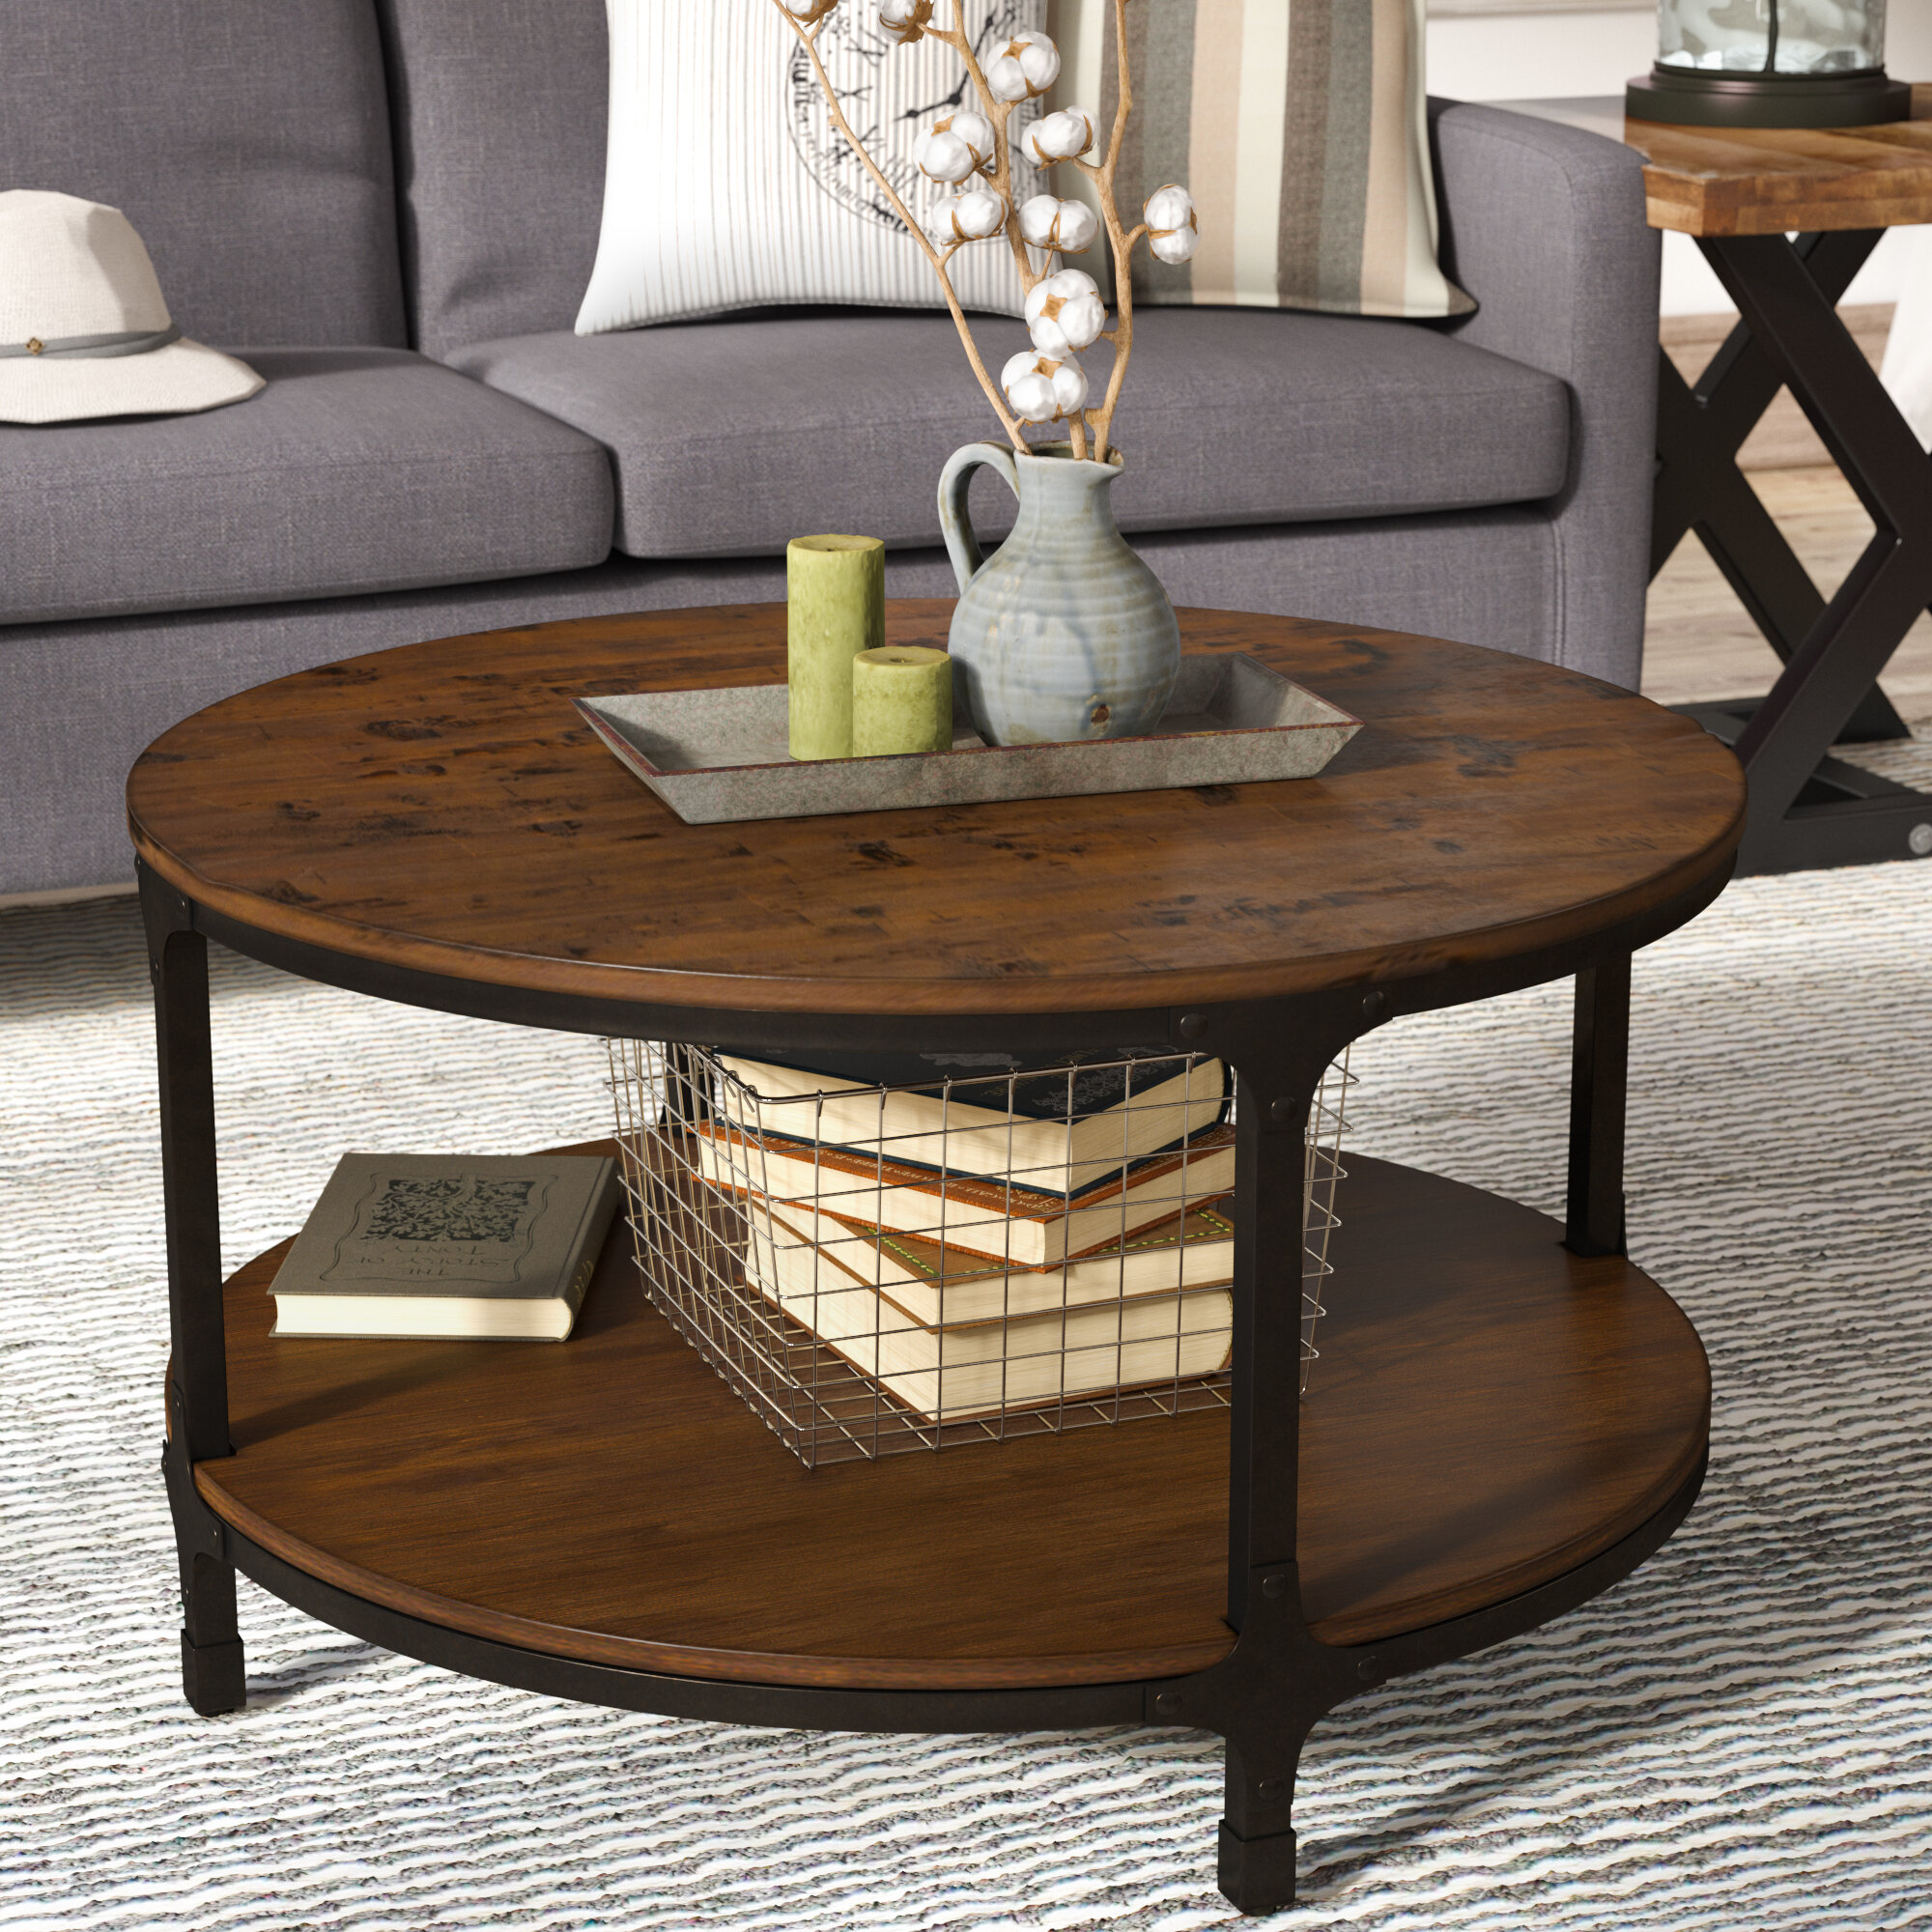 2def58d25a147 Laurel Foundry Modern Farmhouse Carolyn Round Coffee Table   Reviews ...